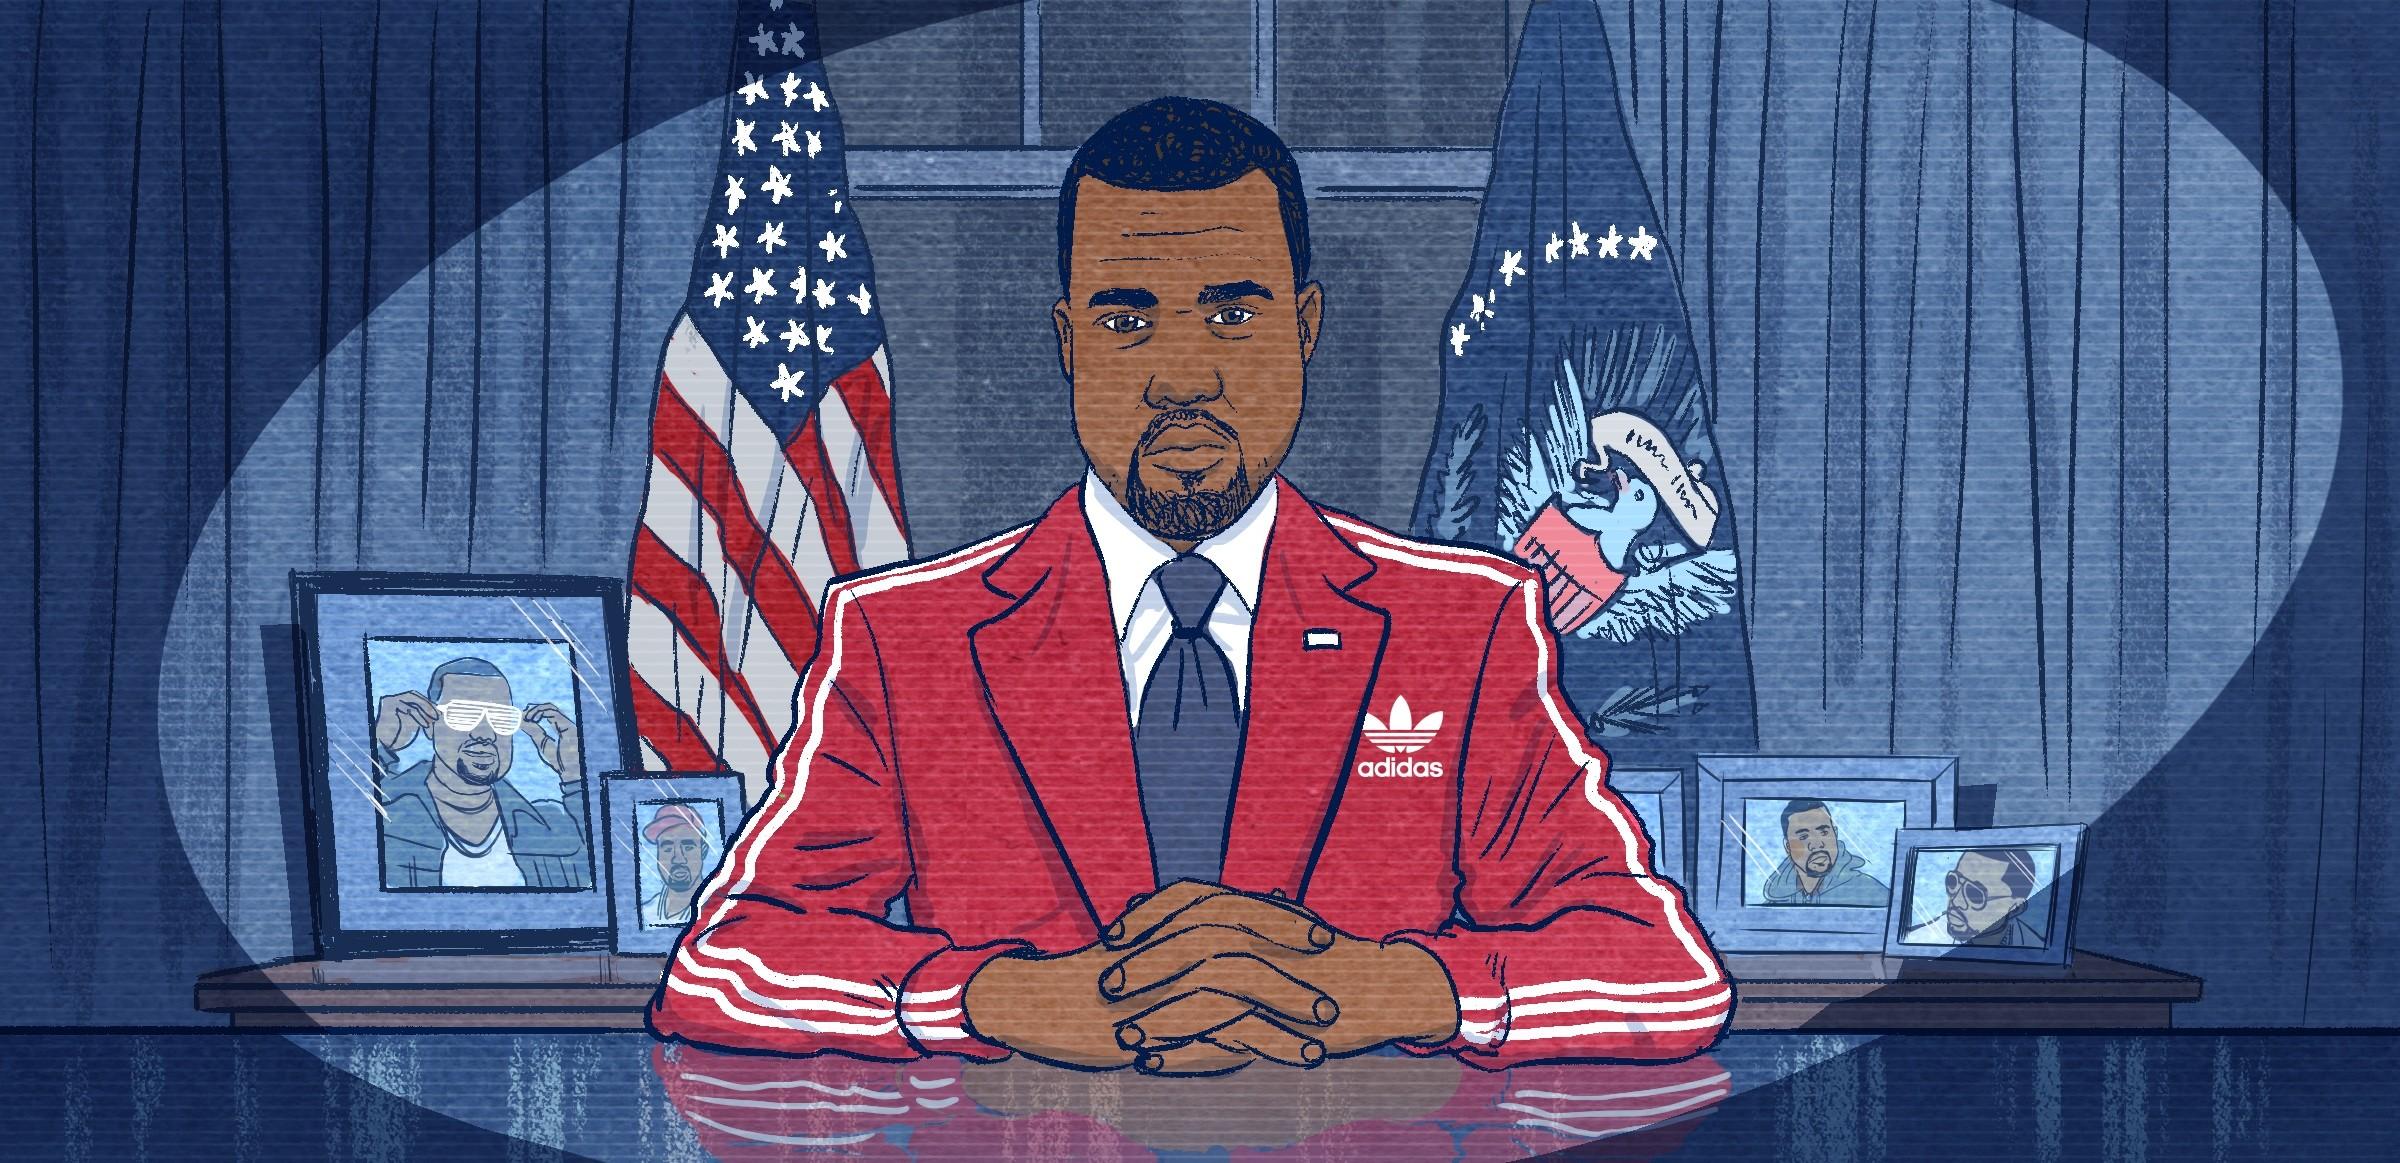 Kanye West's Presidential Hope Receives Backing From Ice Cube – Cerebral  Lemon Cerebral Lemon